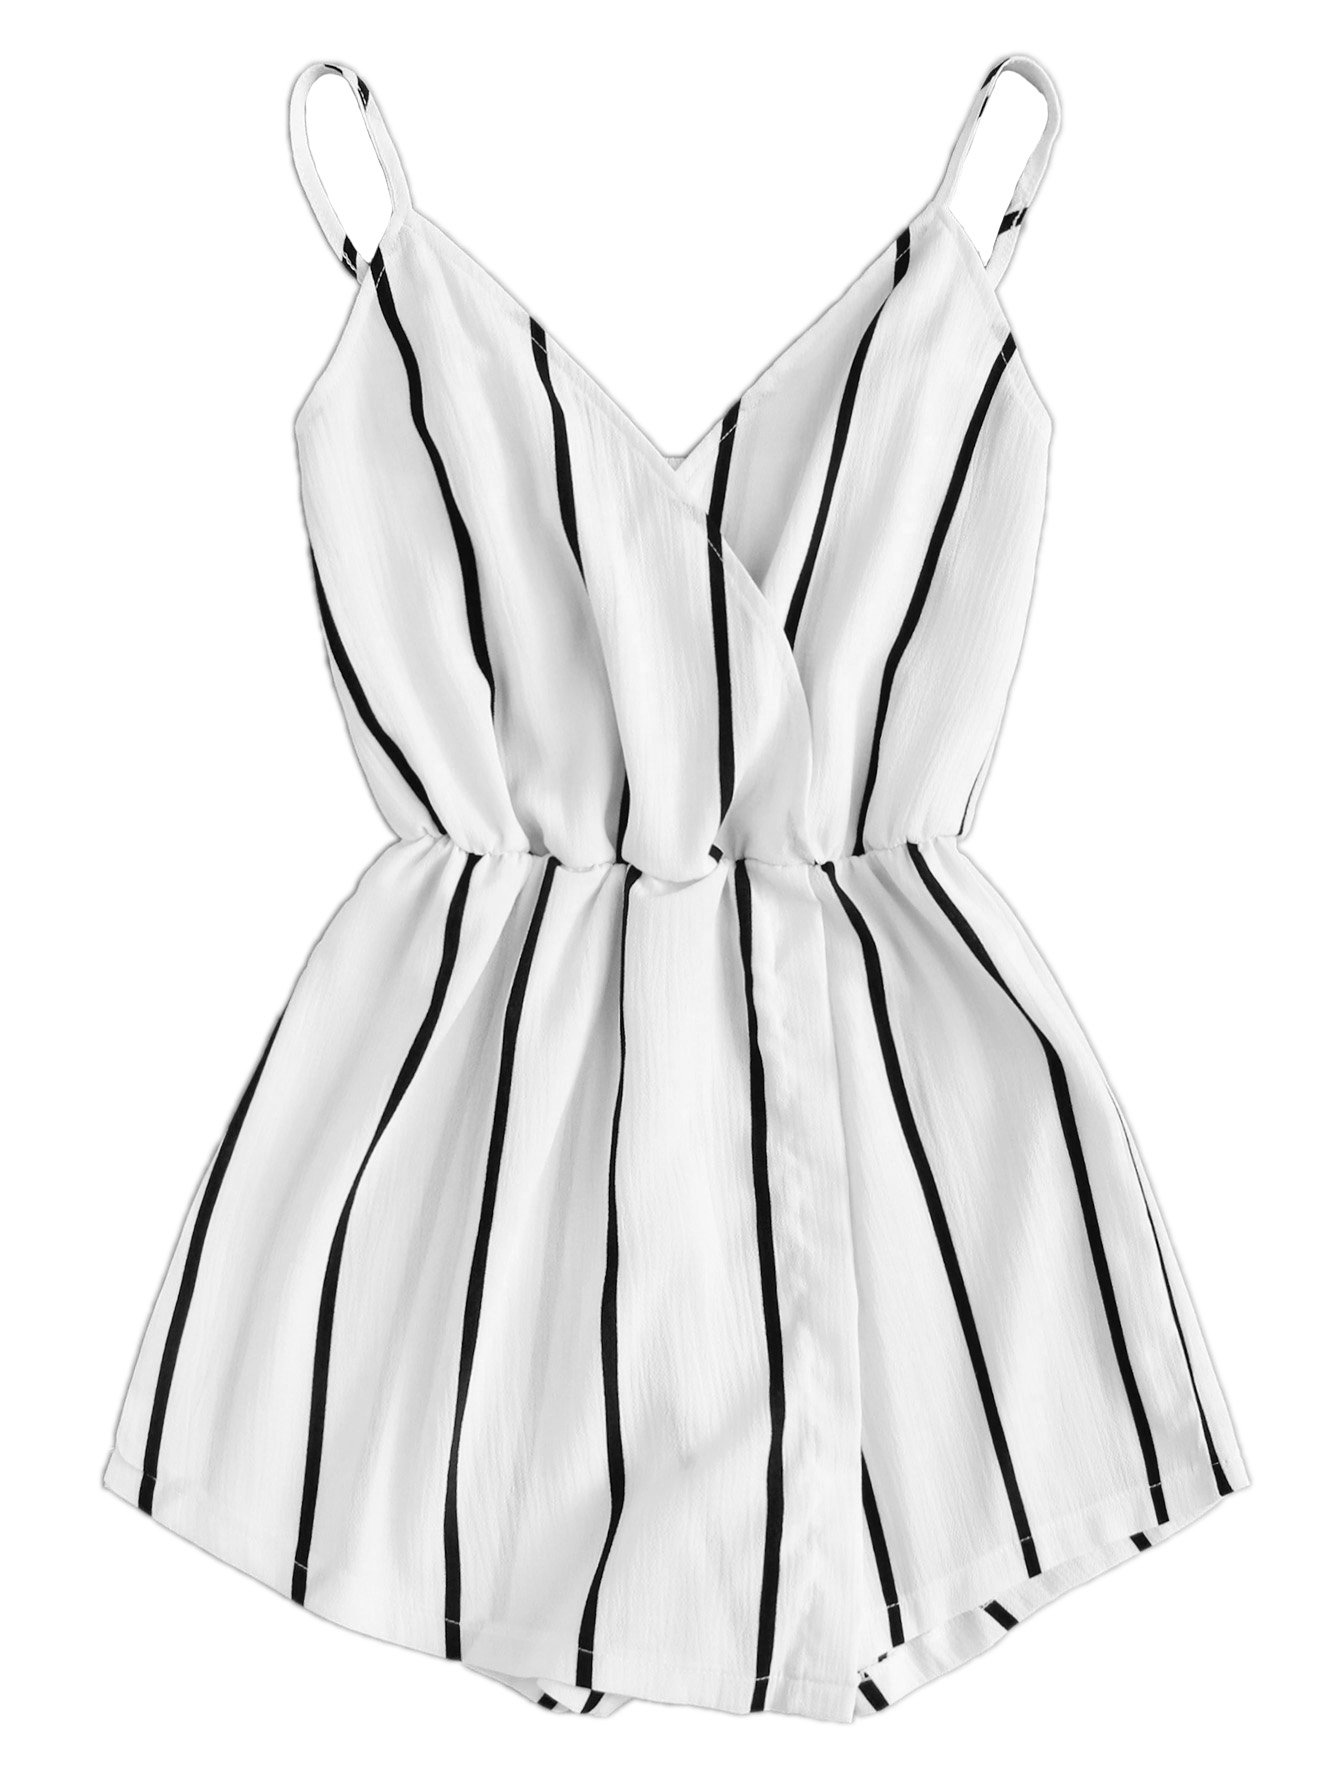 Verdusa Women's Vertical Striped V Neck Wrap Cami Jumpsuit Romper White S